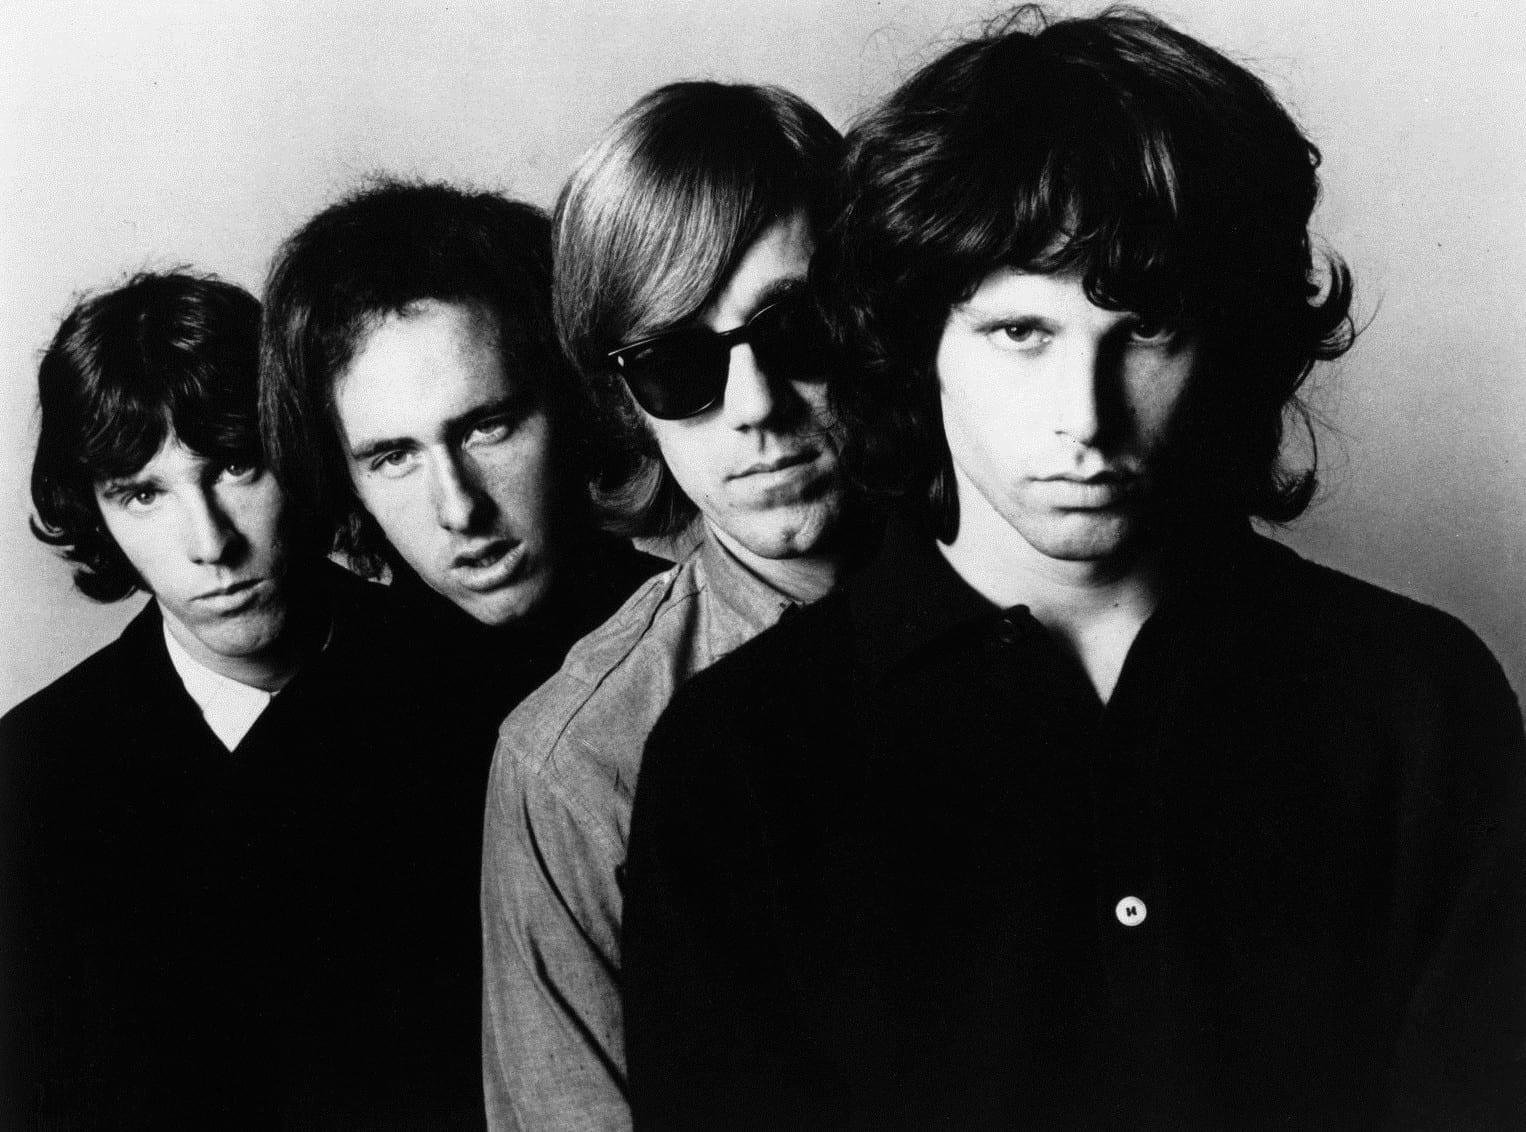 50 Years Of The Doors